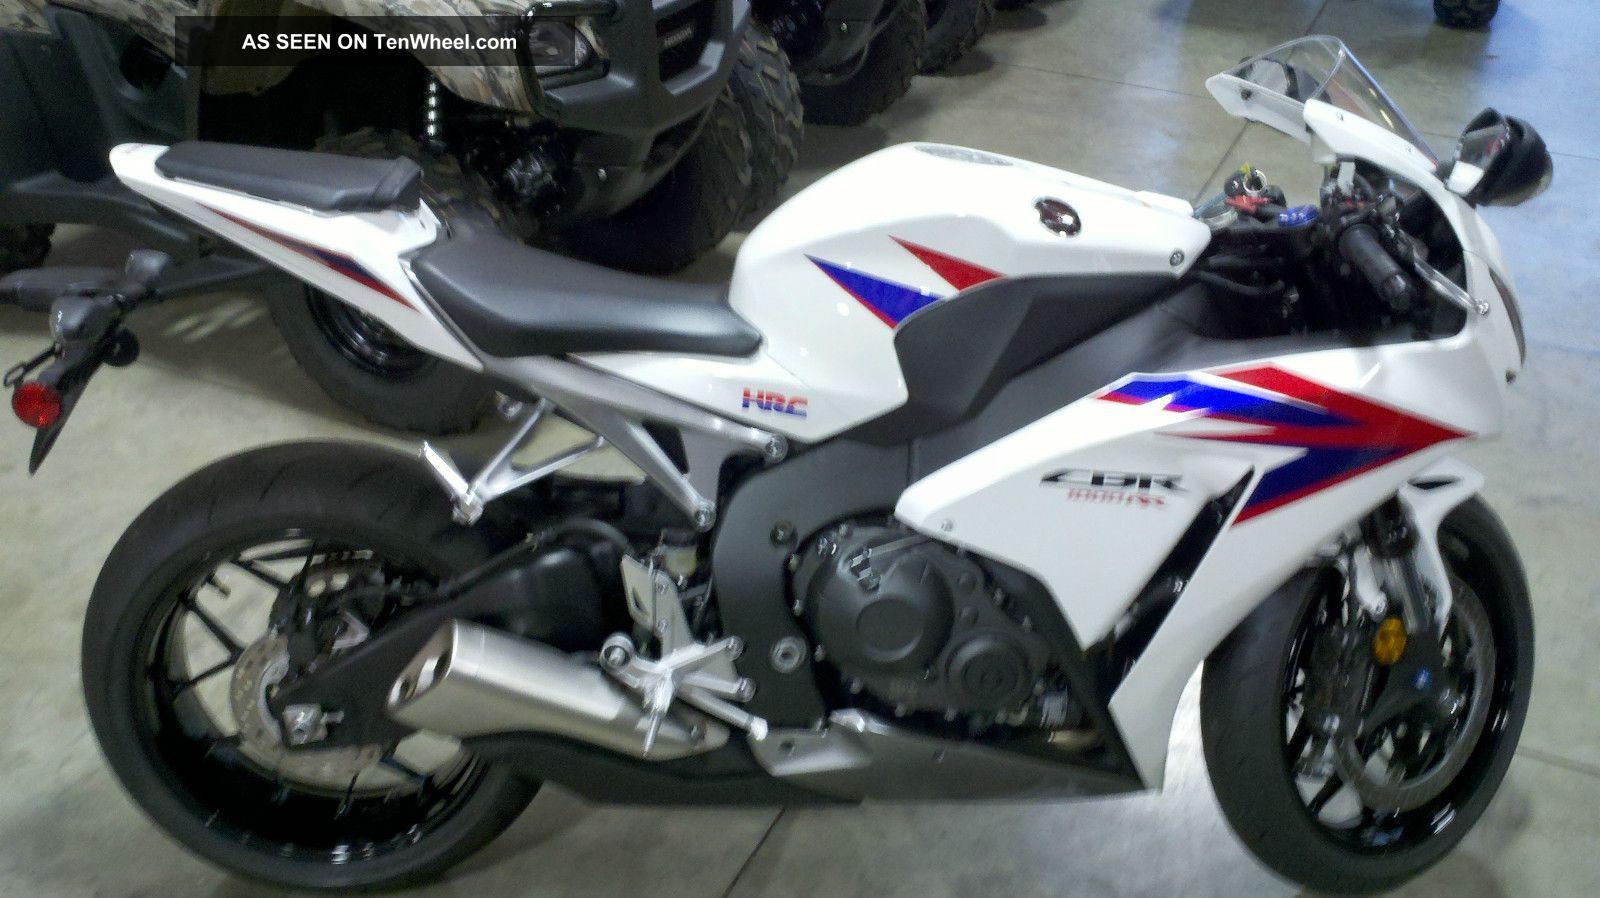 2012 Honda Cbr1000rr 20th Aniversary CBR photo